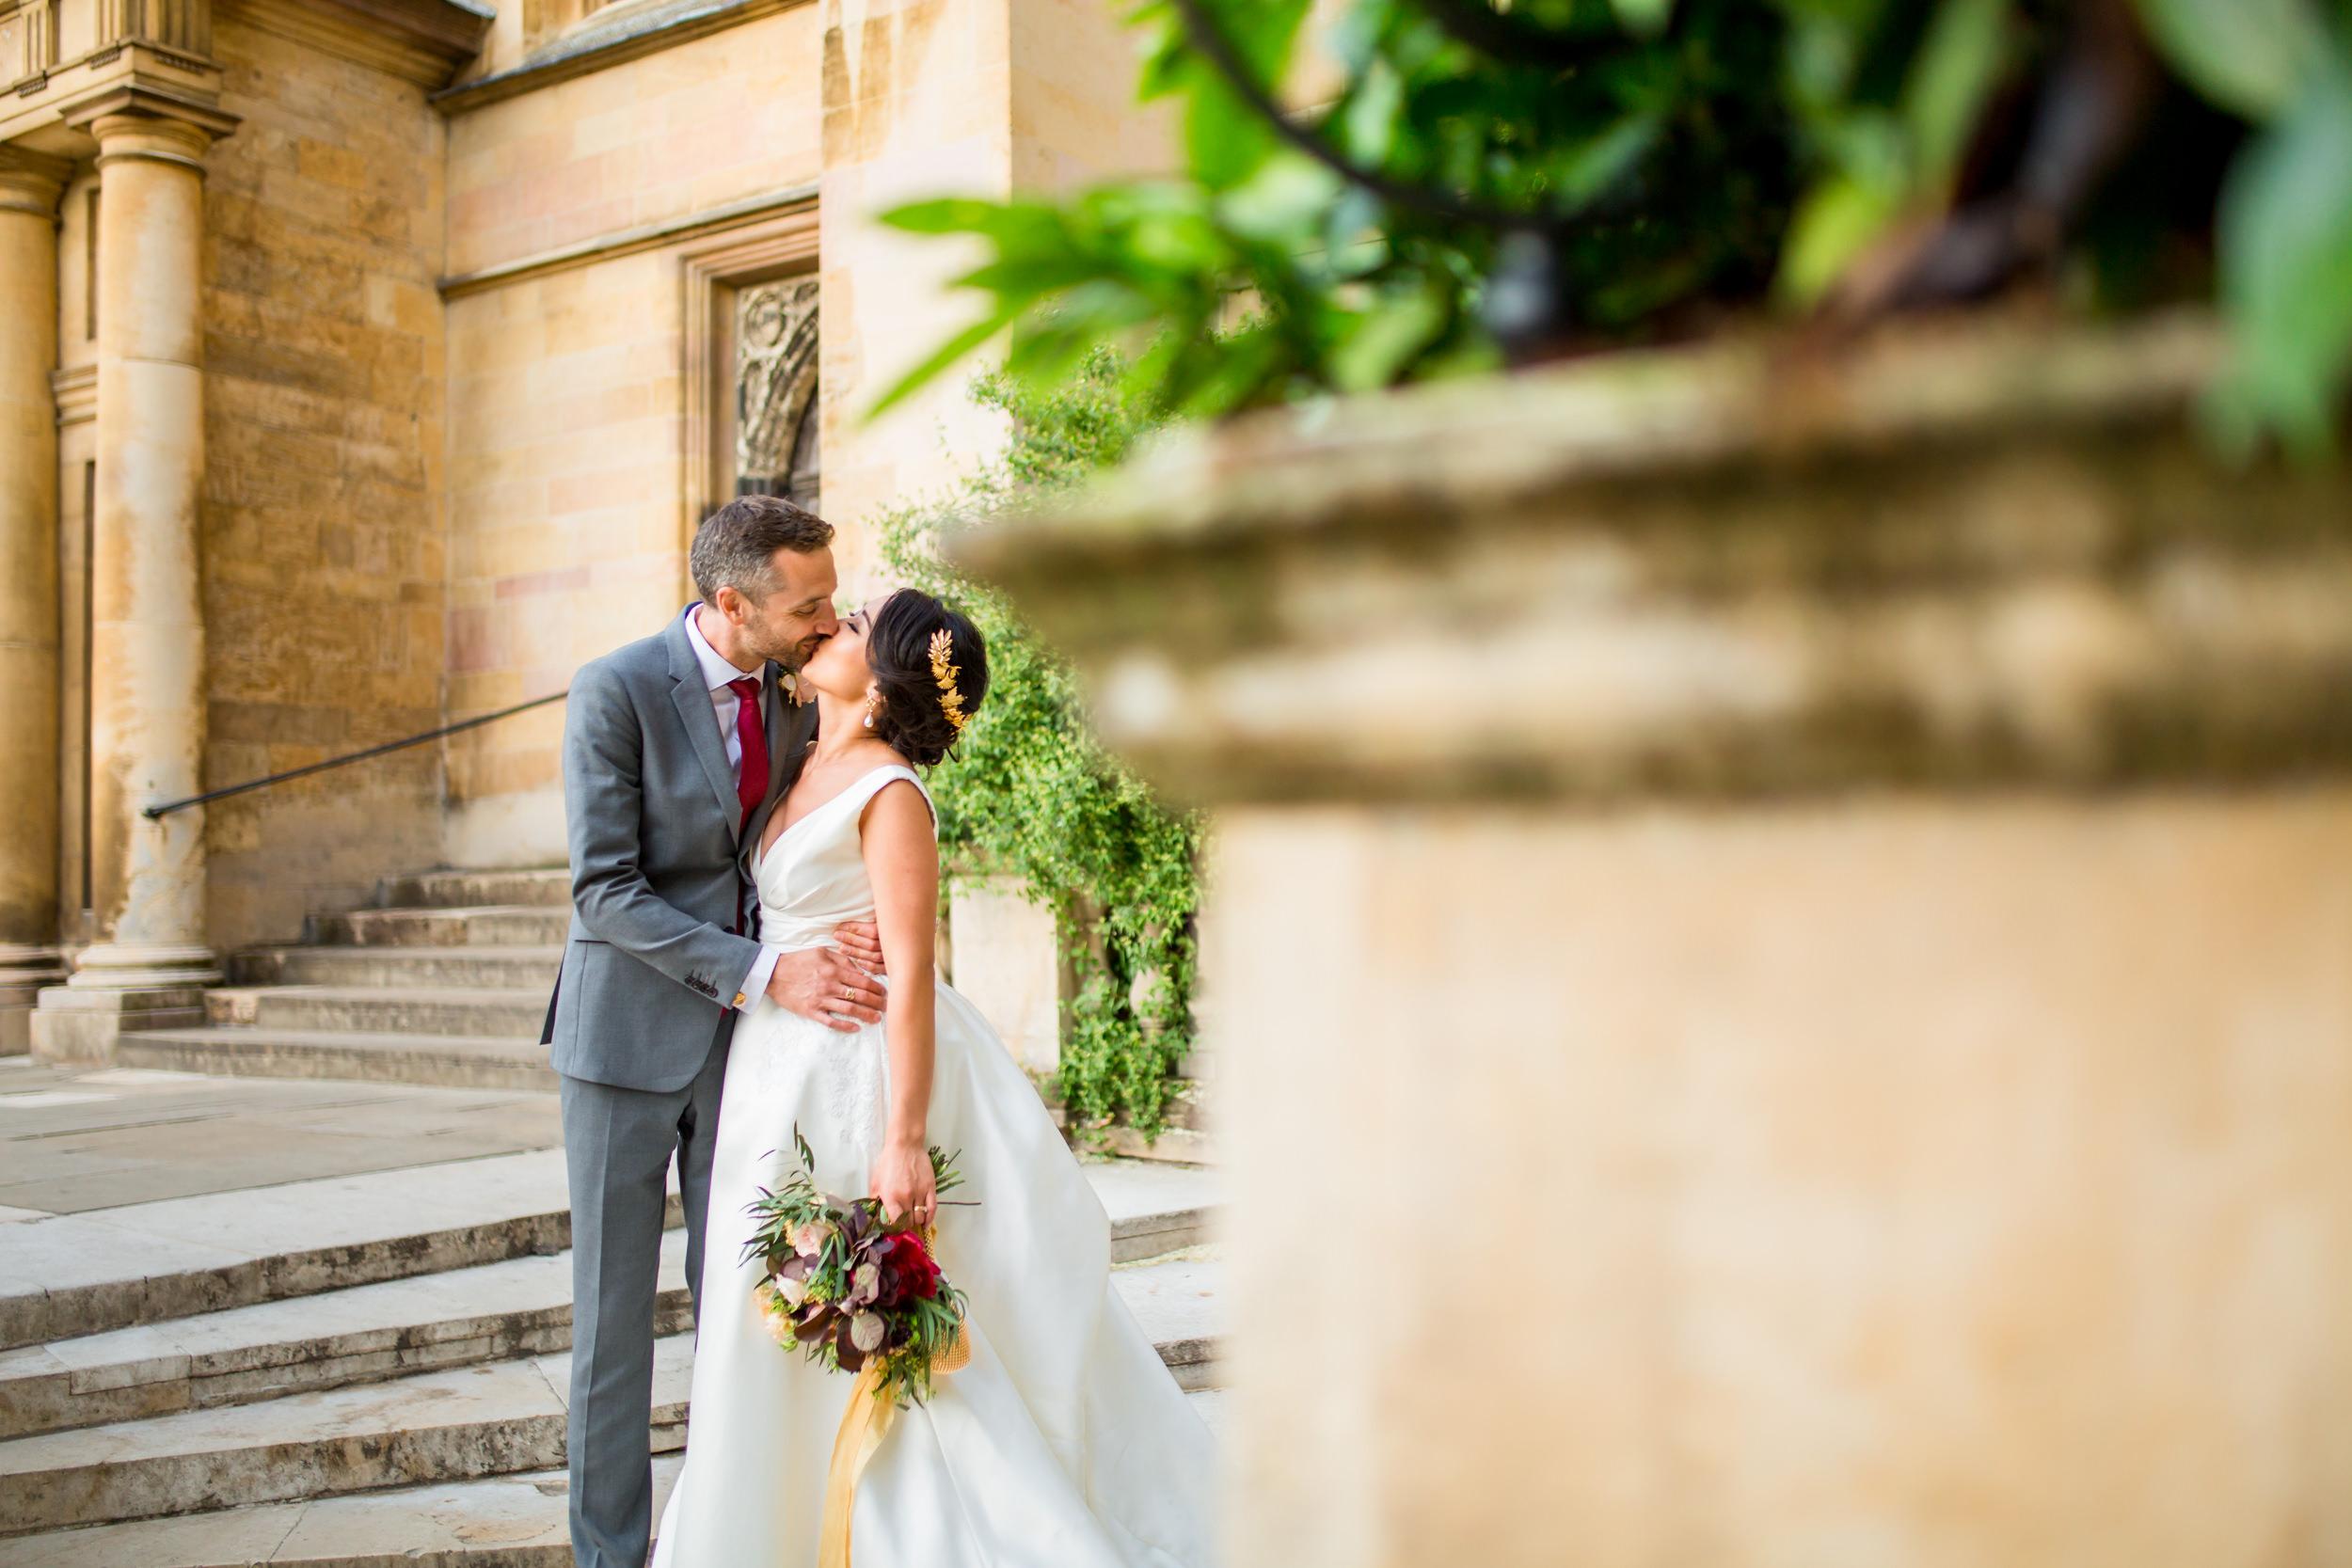 Vibrant Wedding Photographer London